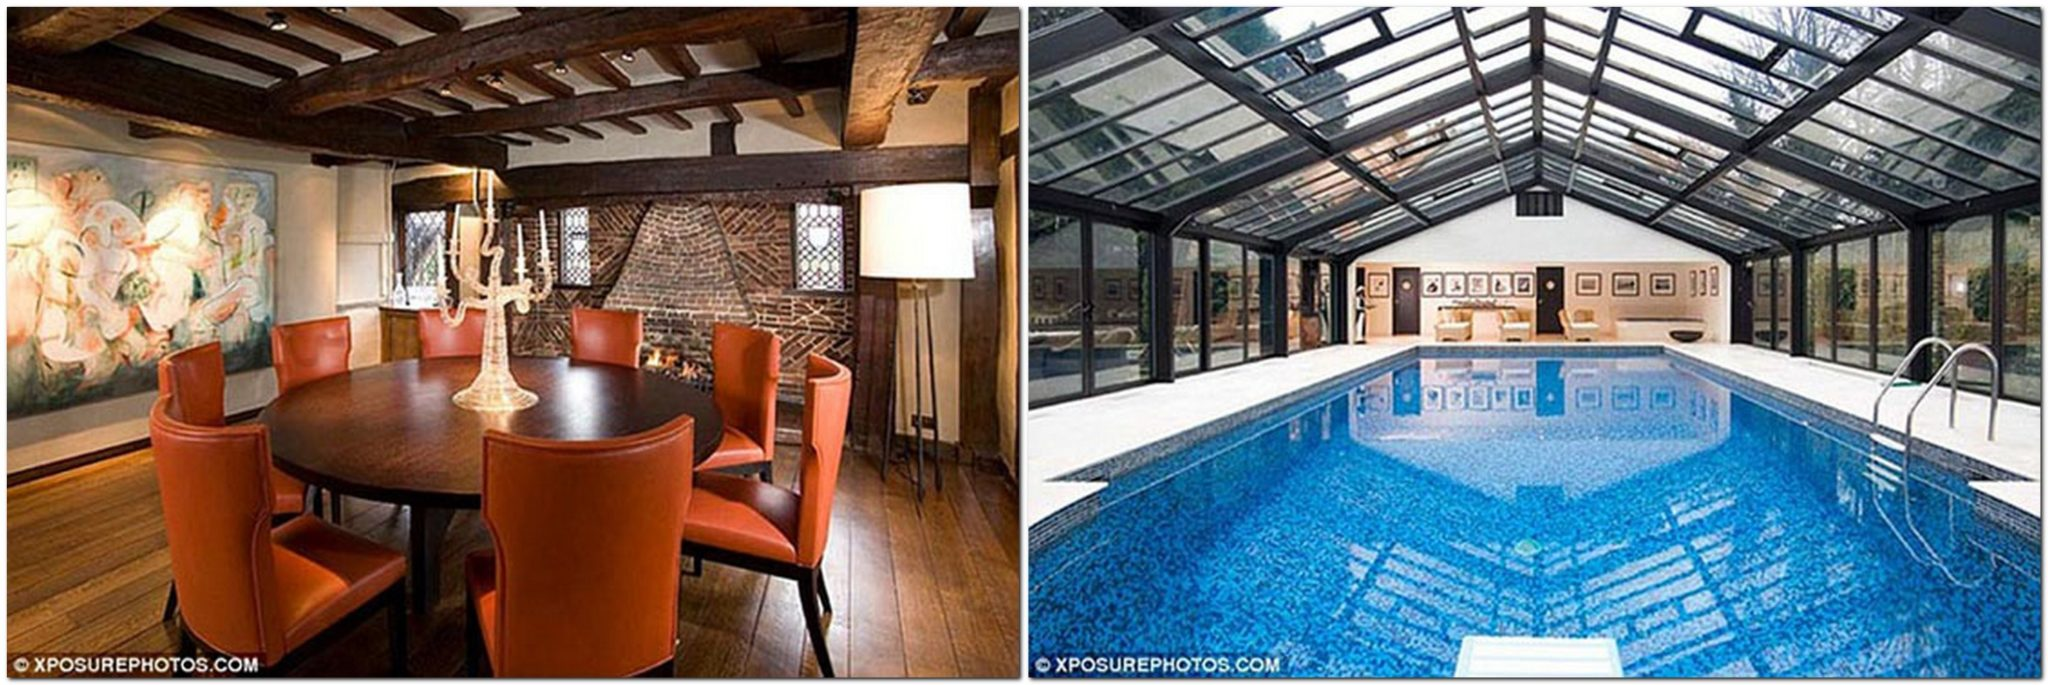 celebrities-luxurious-houses-1